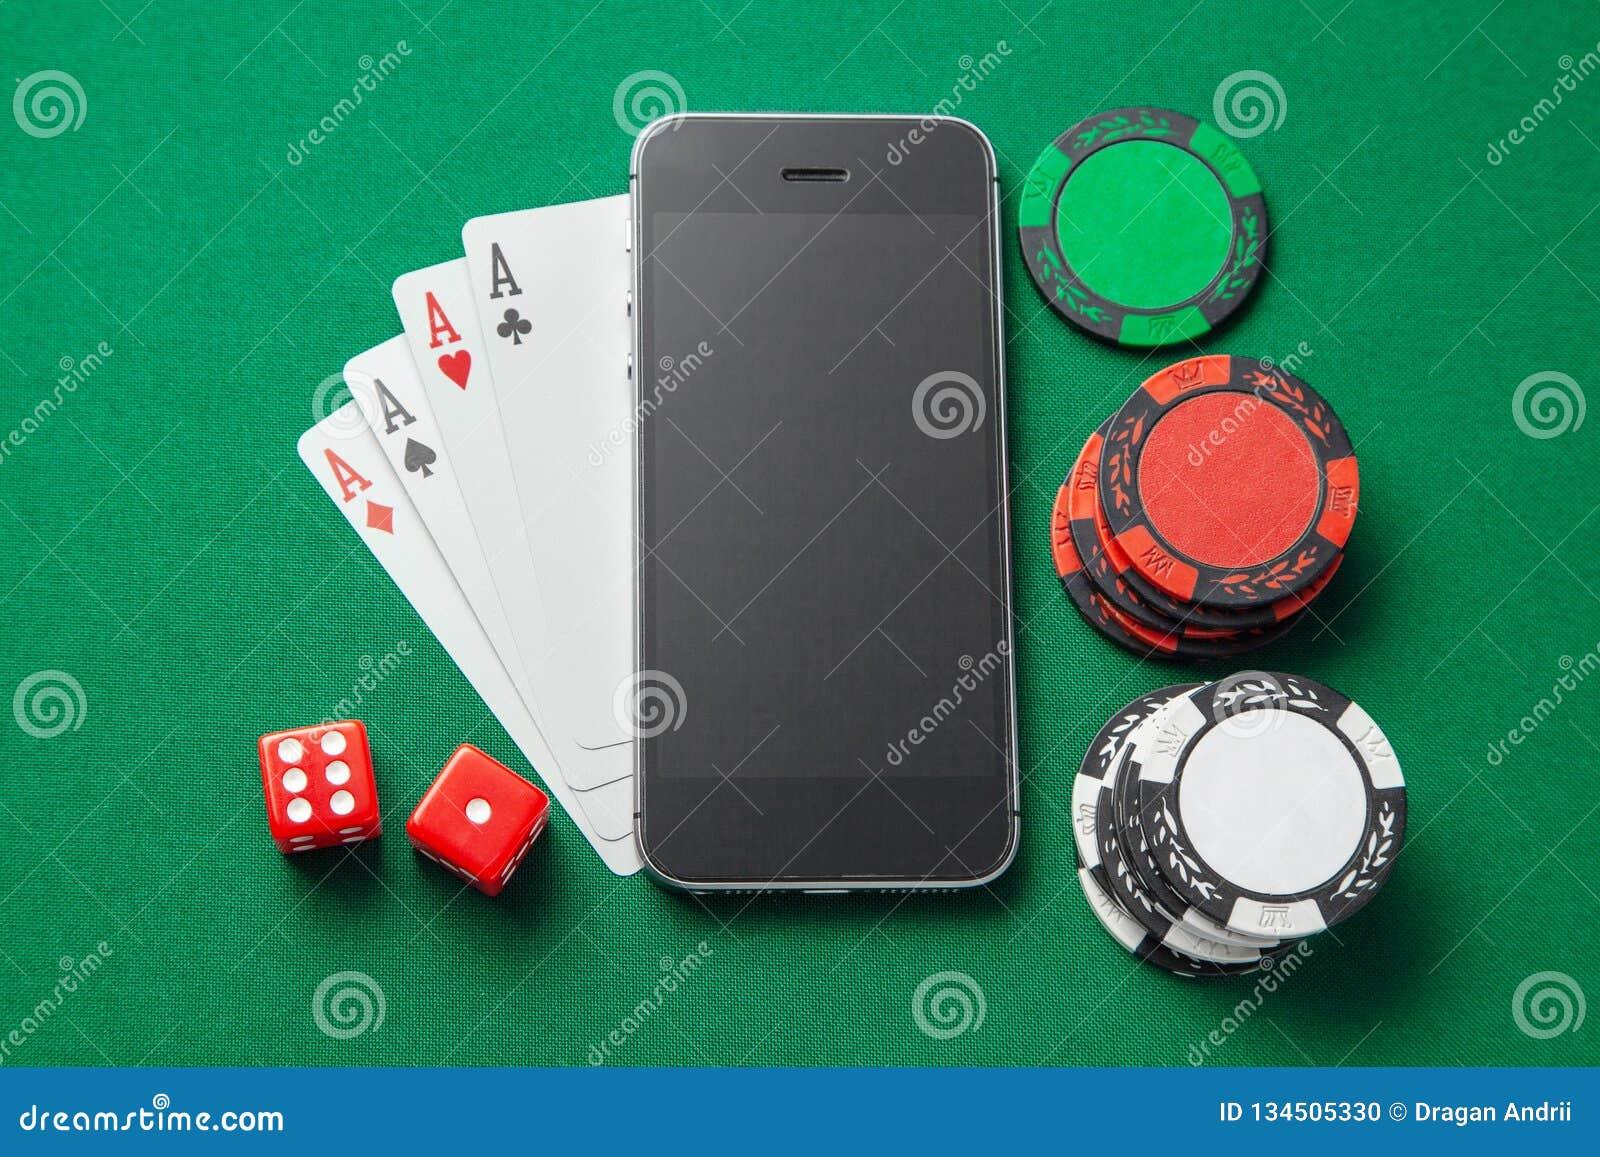 Dice Casino online, free